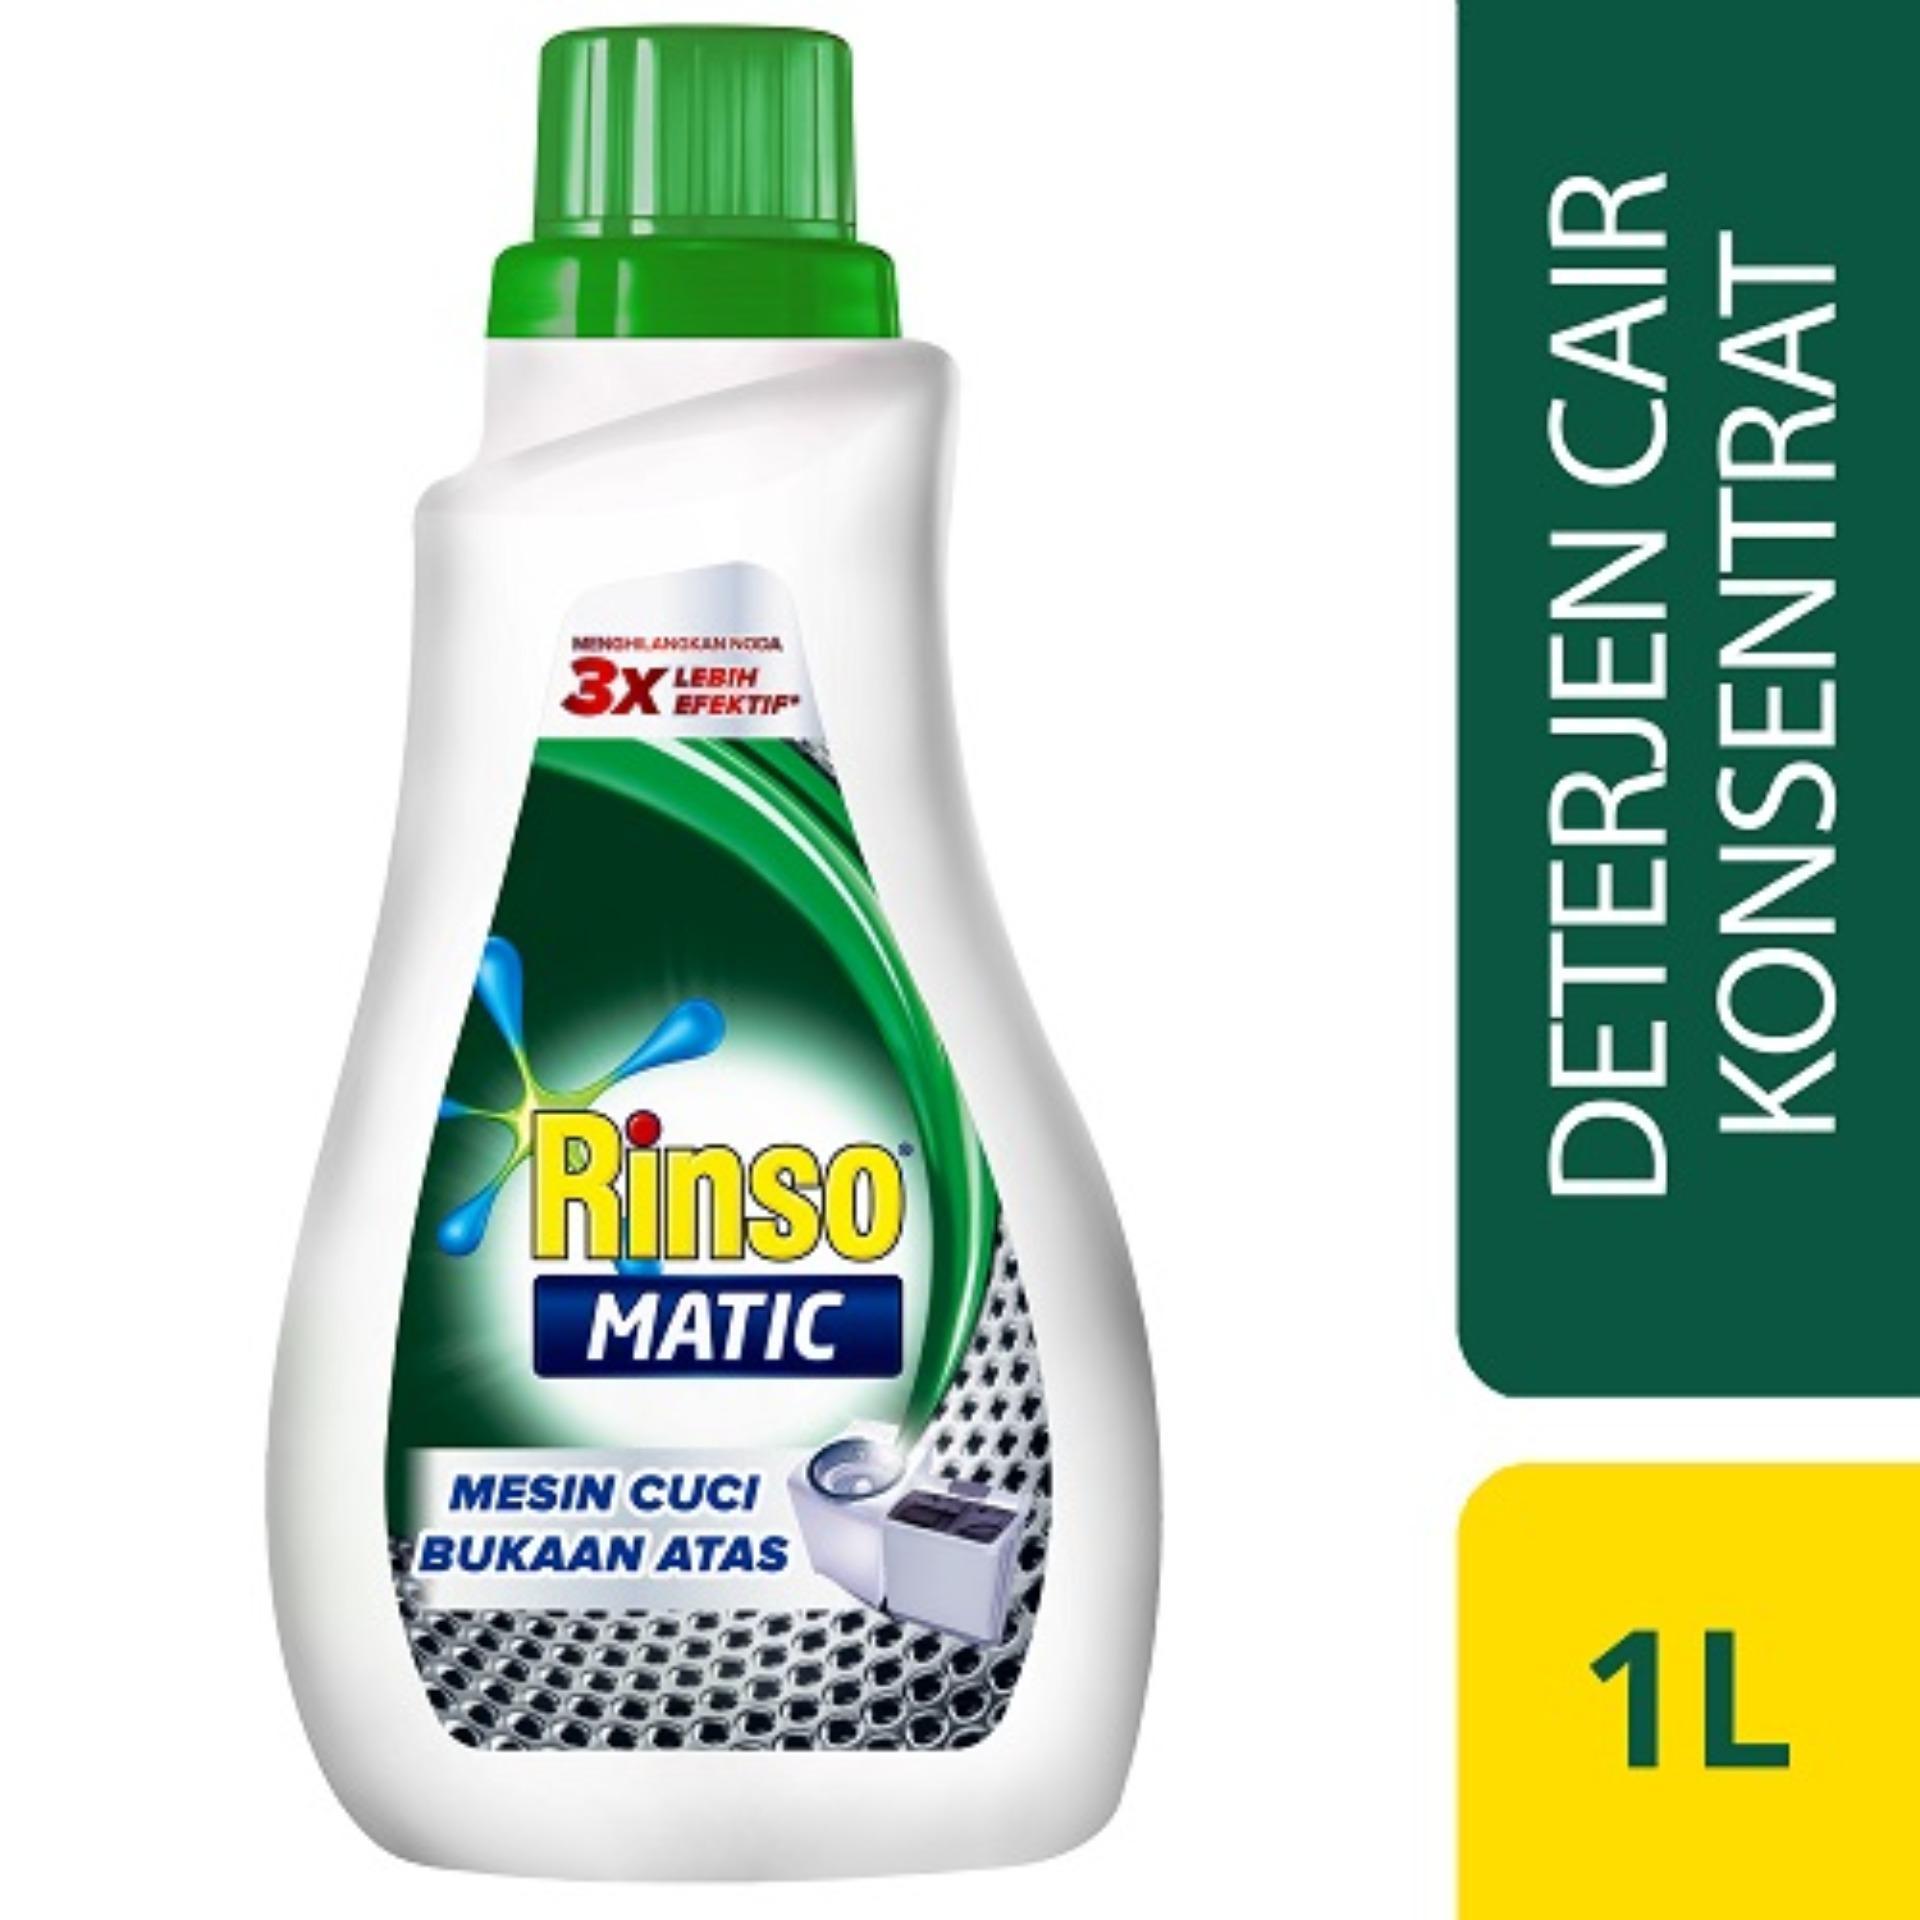 Rinso Matic Cair Mesin Cuci Bukaan Atas Botol - 1 L